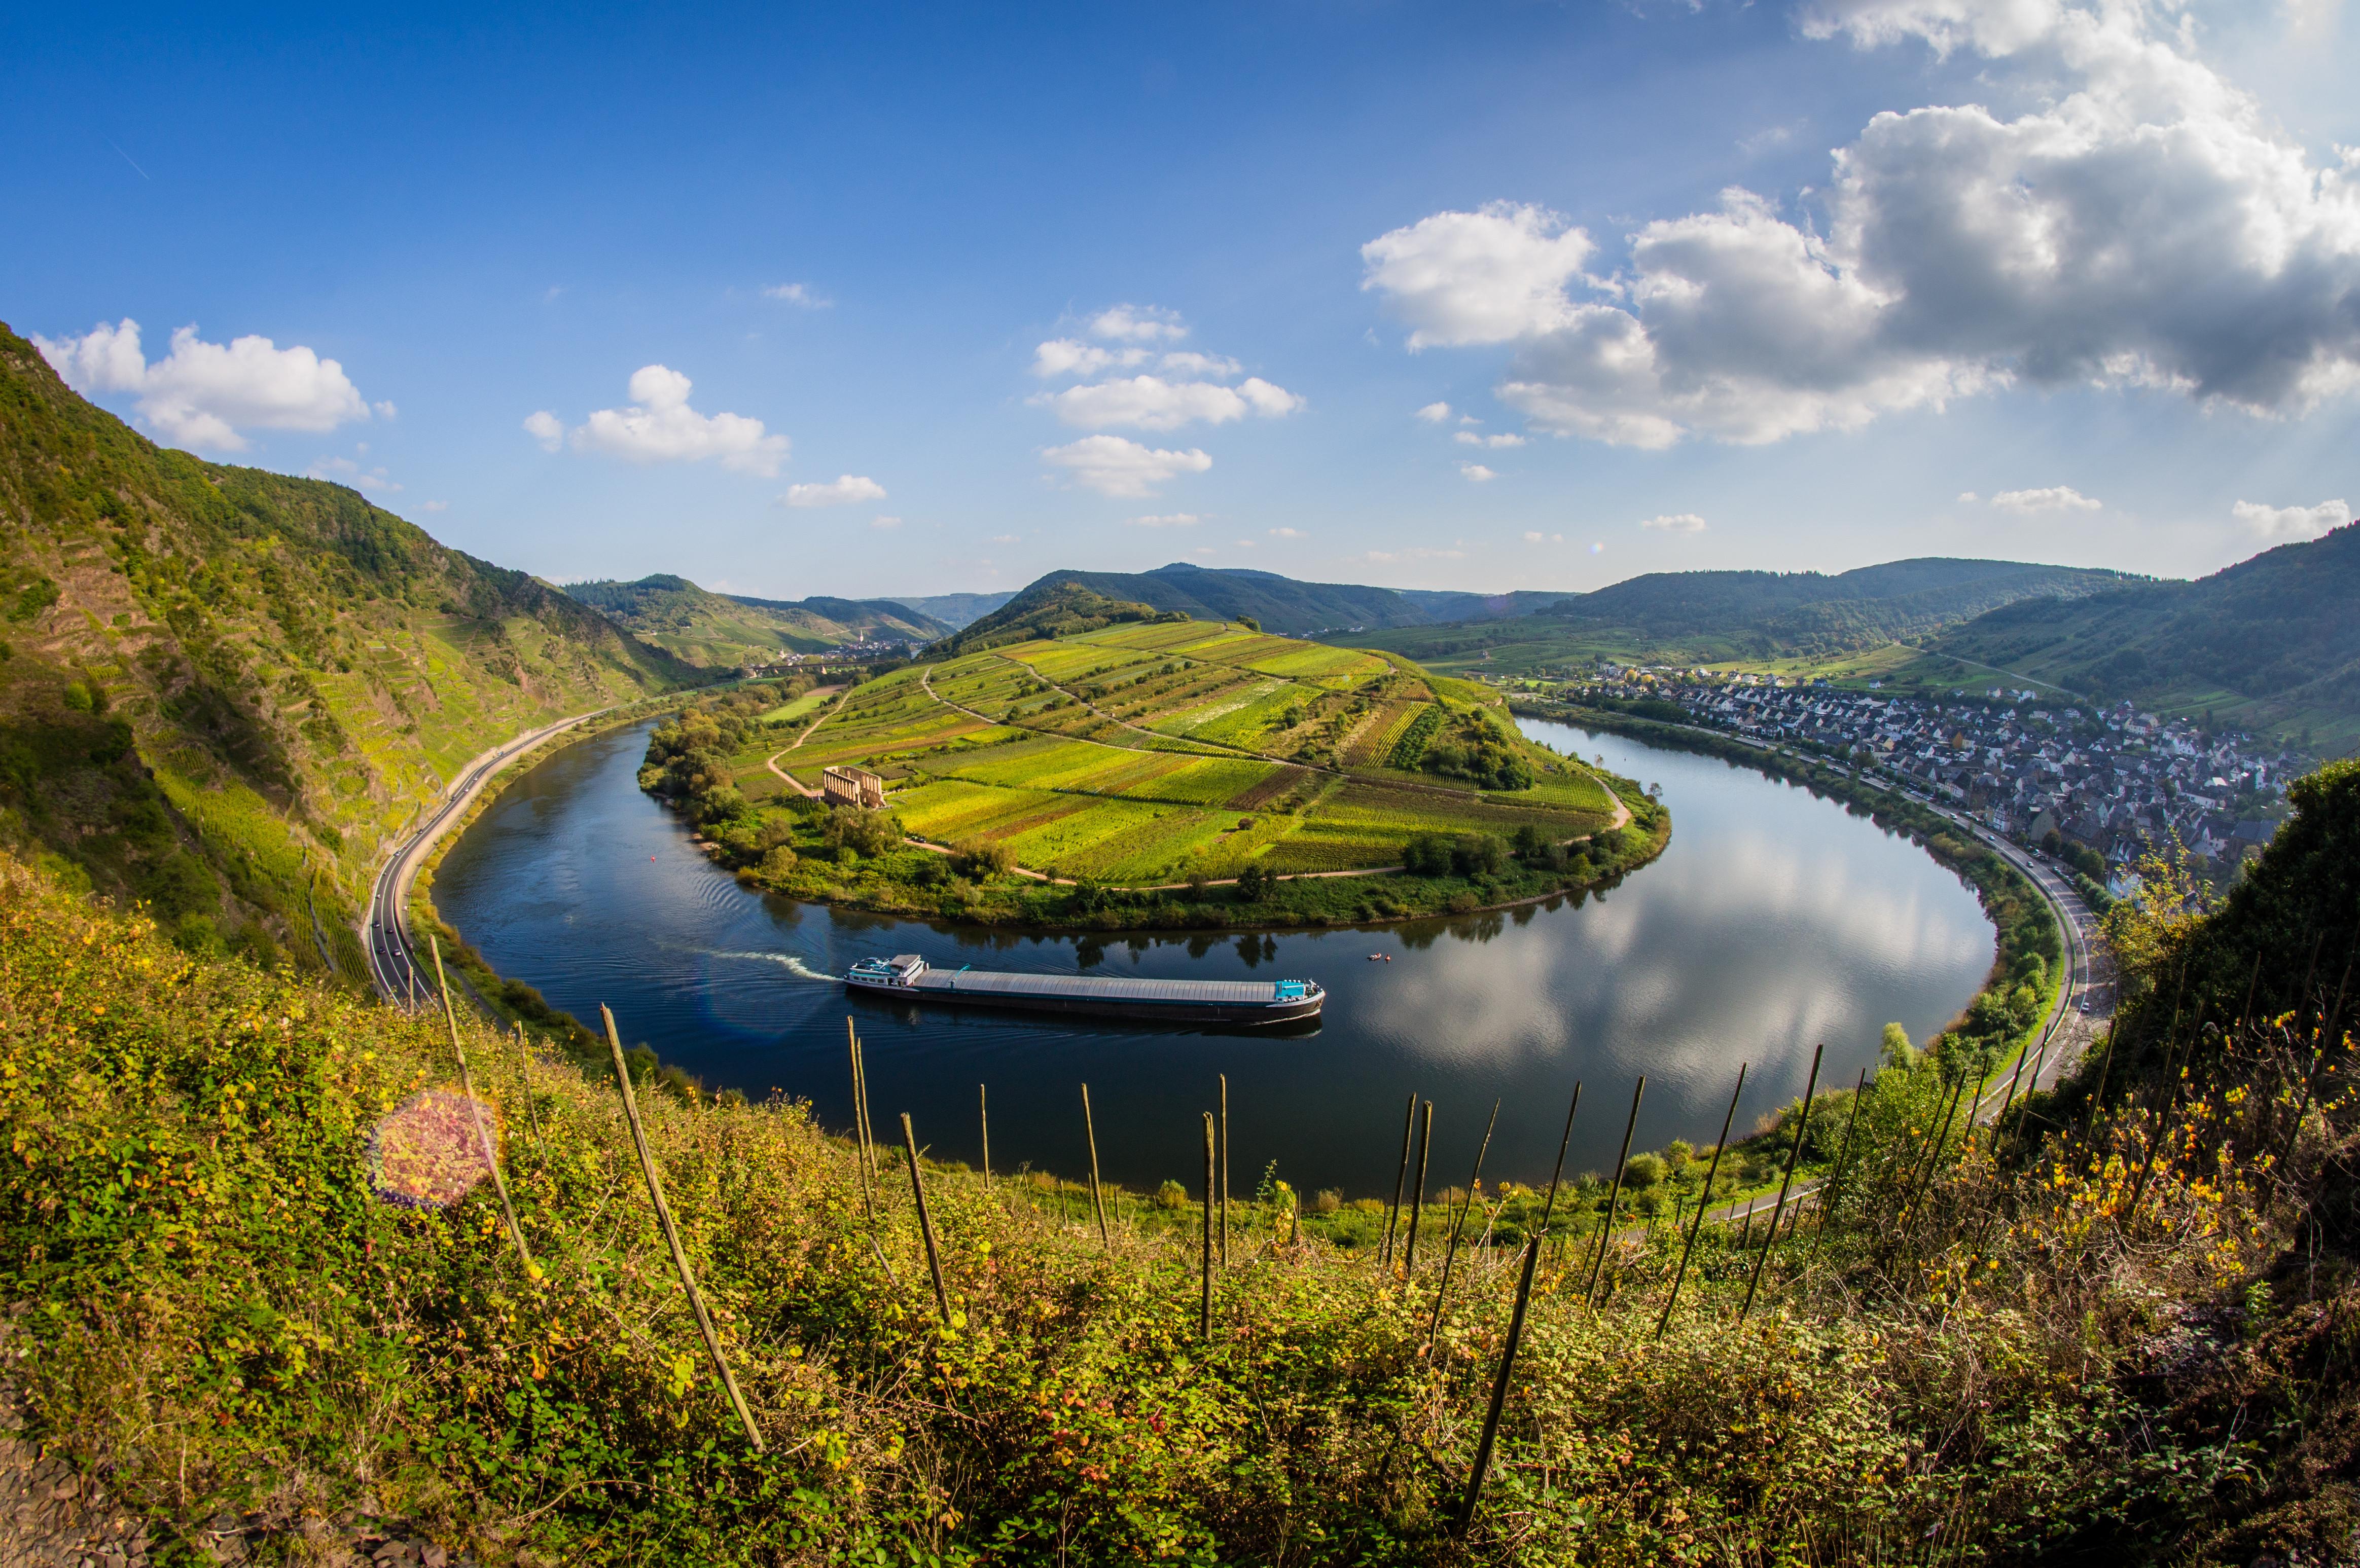 обои Германия, подкова, река, деревья картинки фото